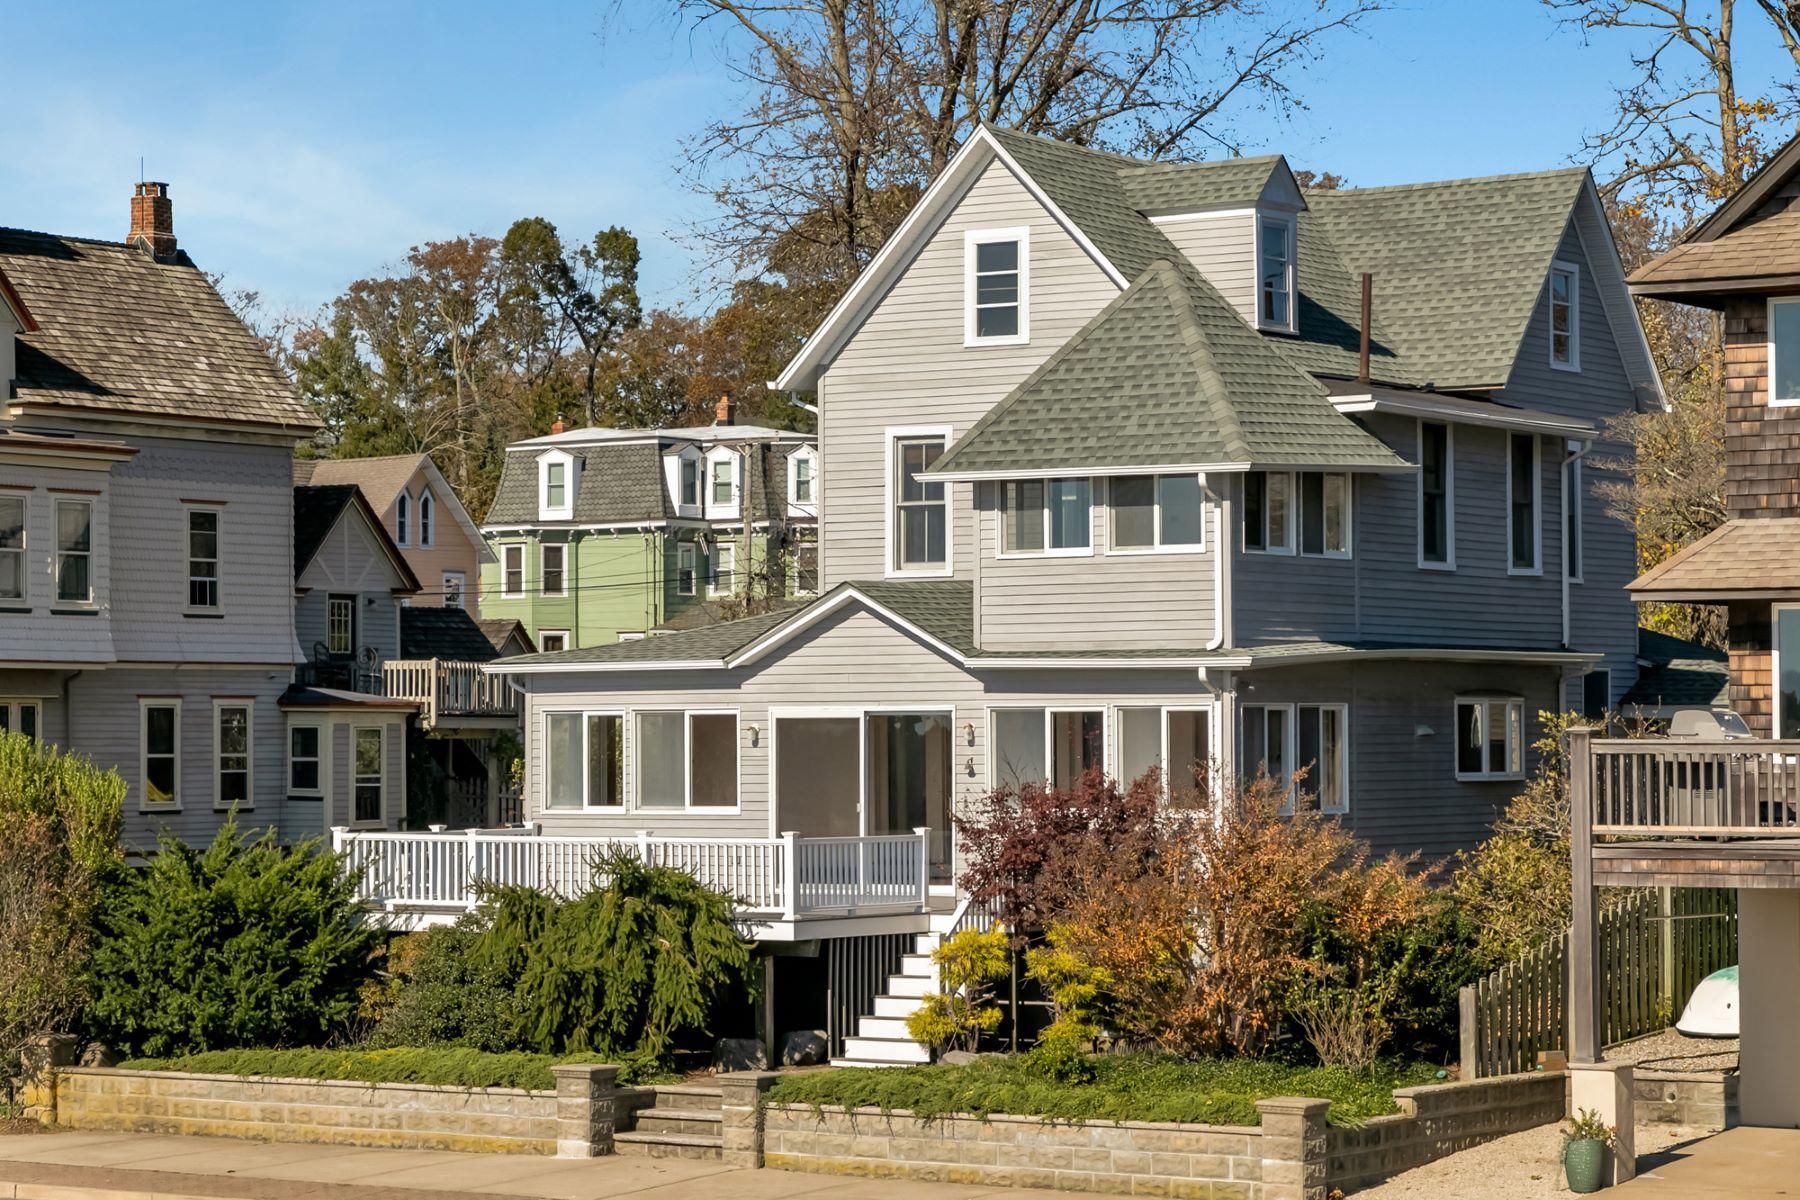 Single Family Homes för Försäljning vid Commanding One Of The Most Coveted Views Of The Toms River 74 River Avenue, Island Heights, New Jersey 08732 Förenta staterna